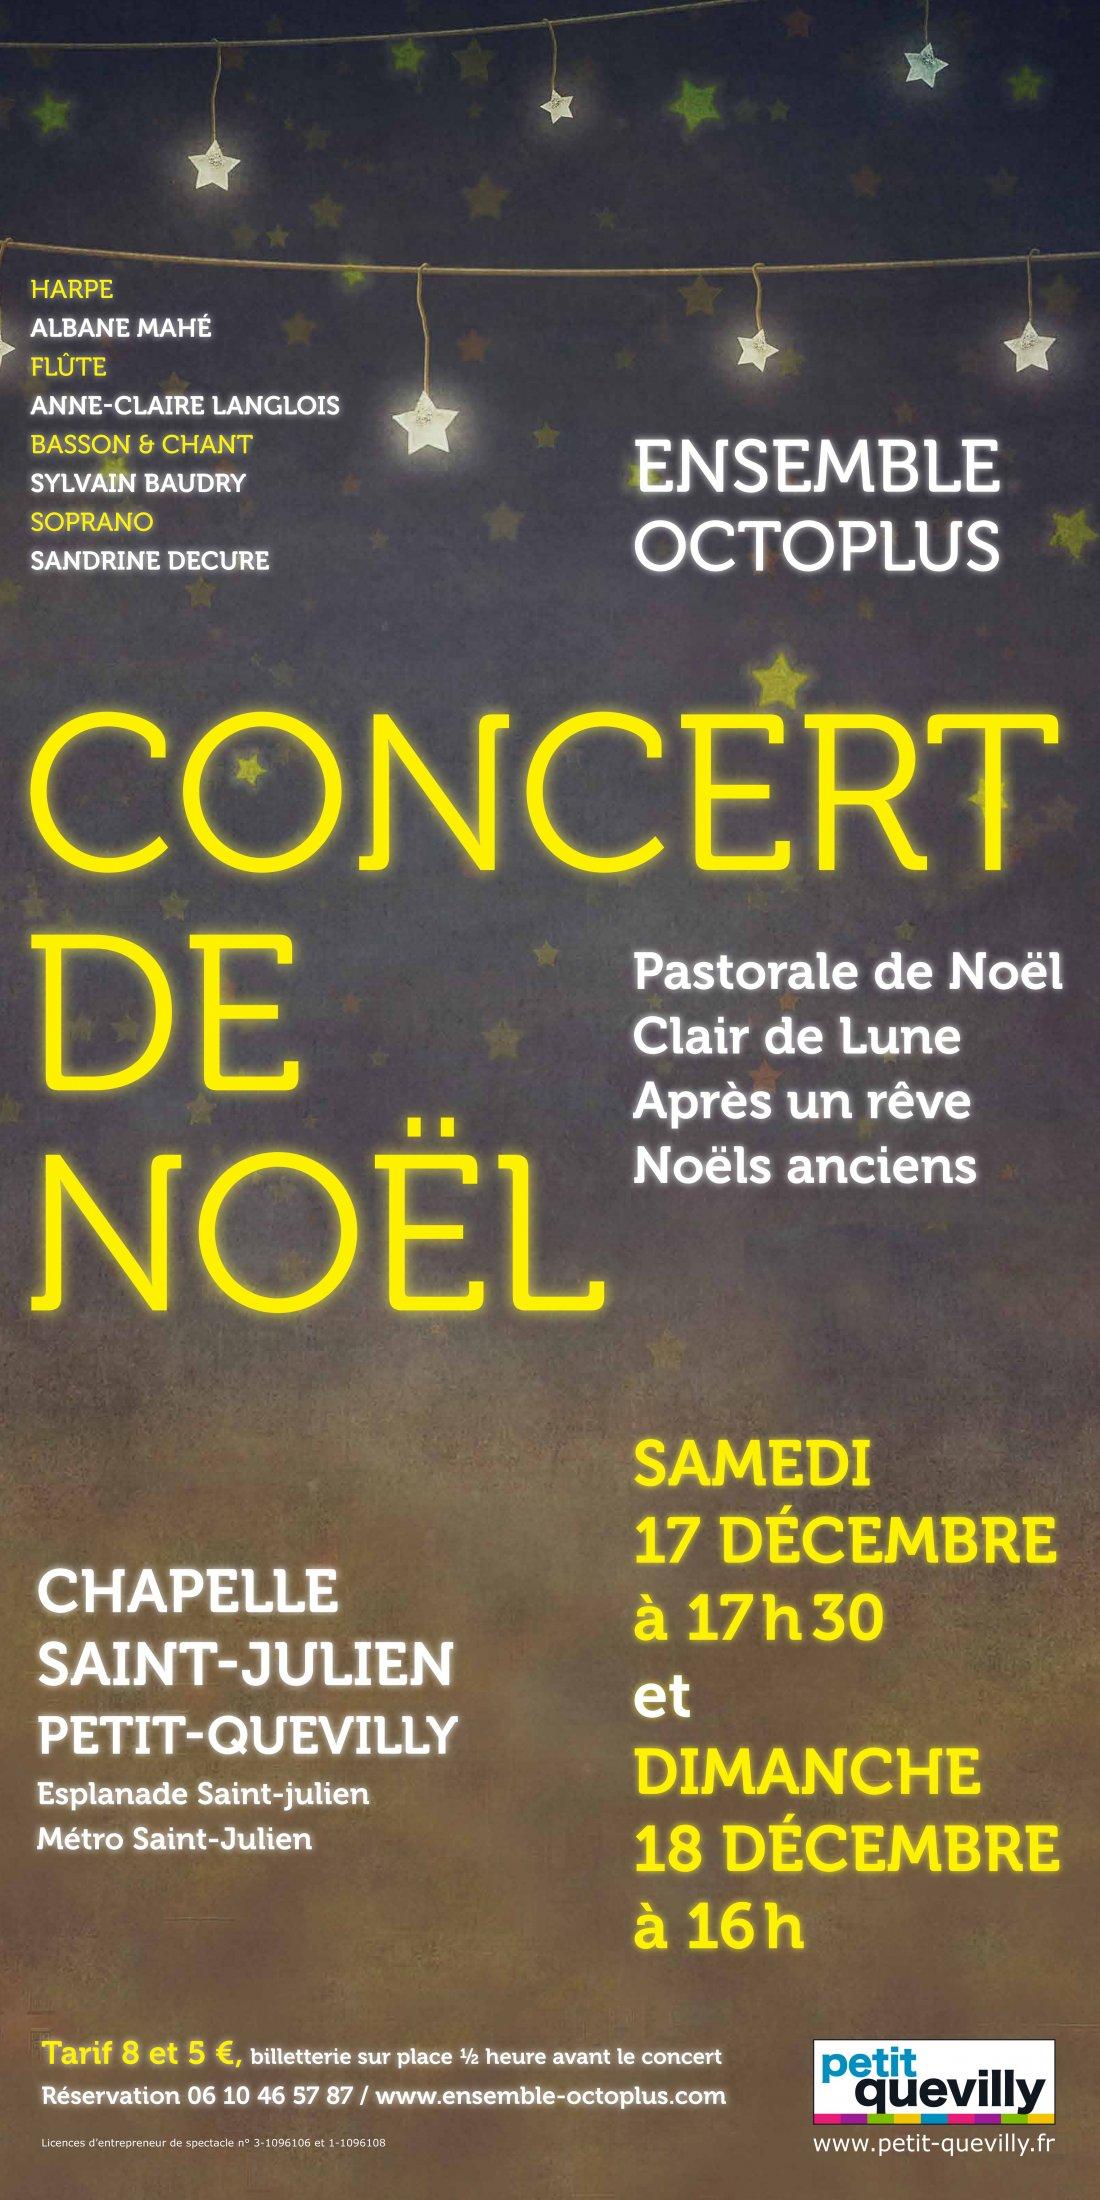 Concert De Noel Aff 0-page0(1)